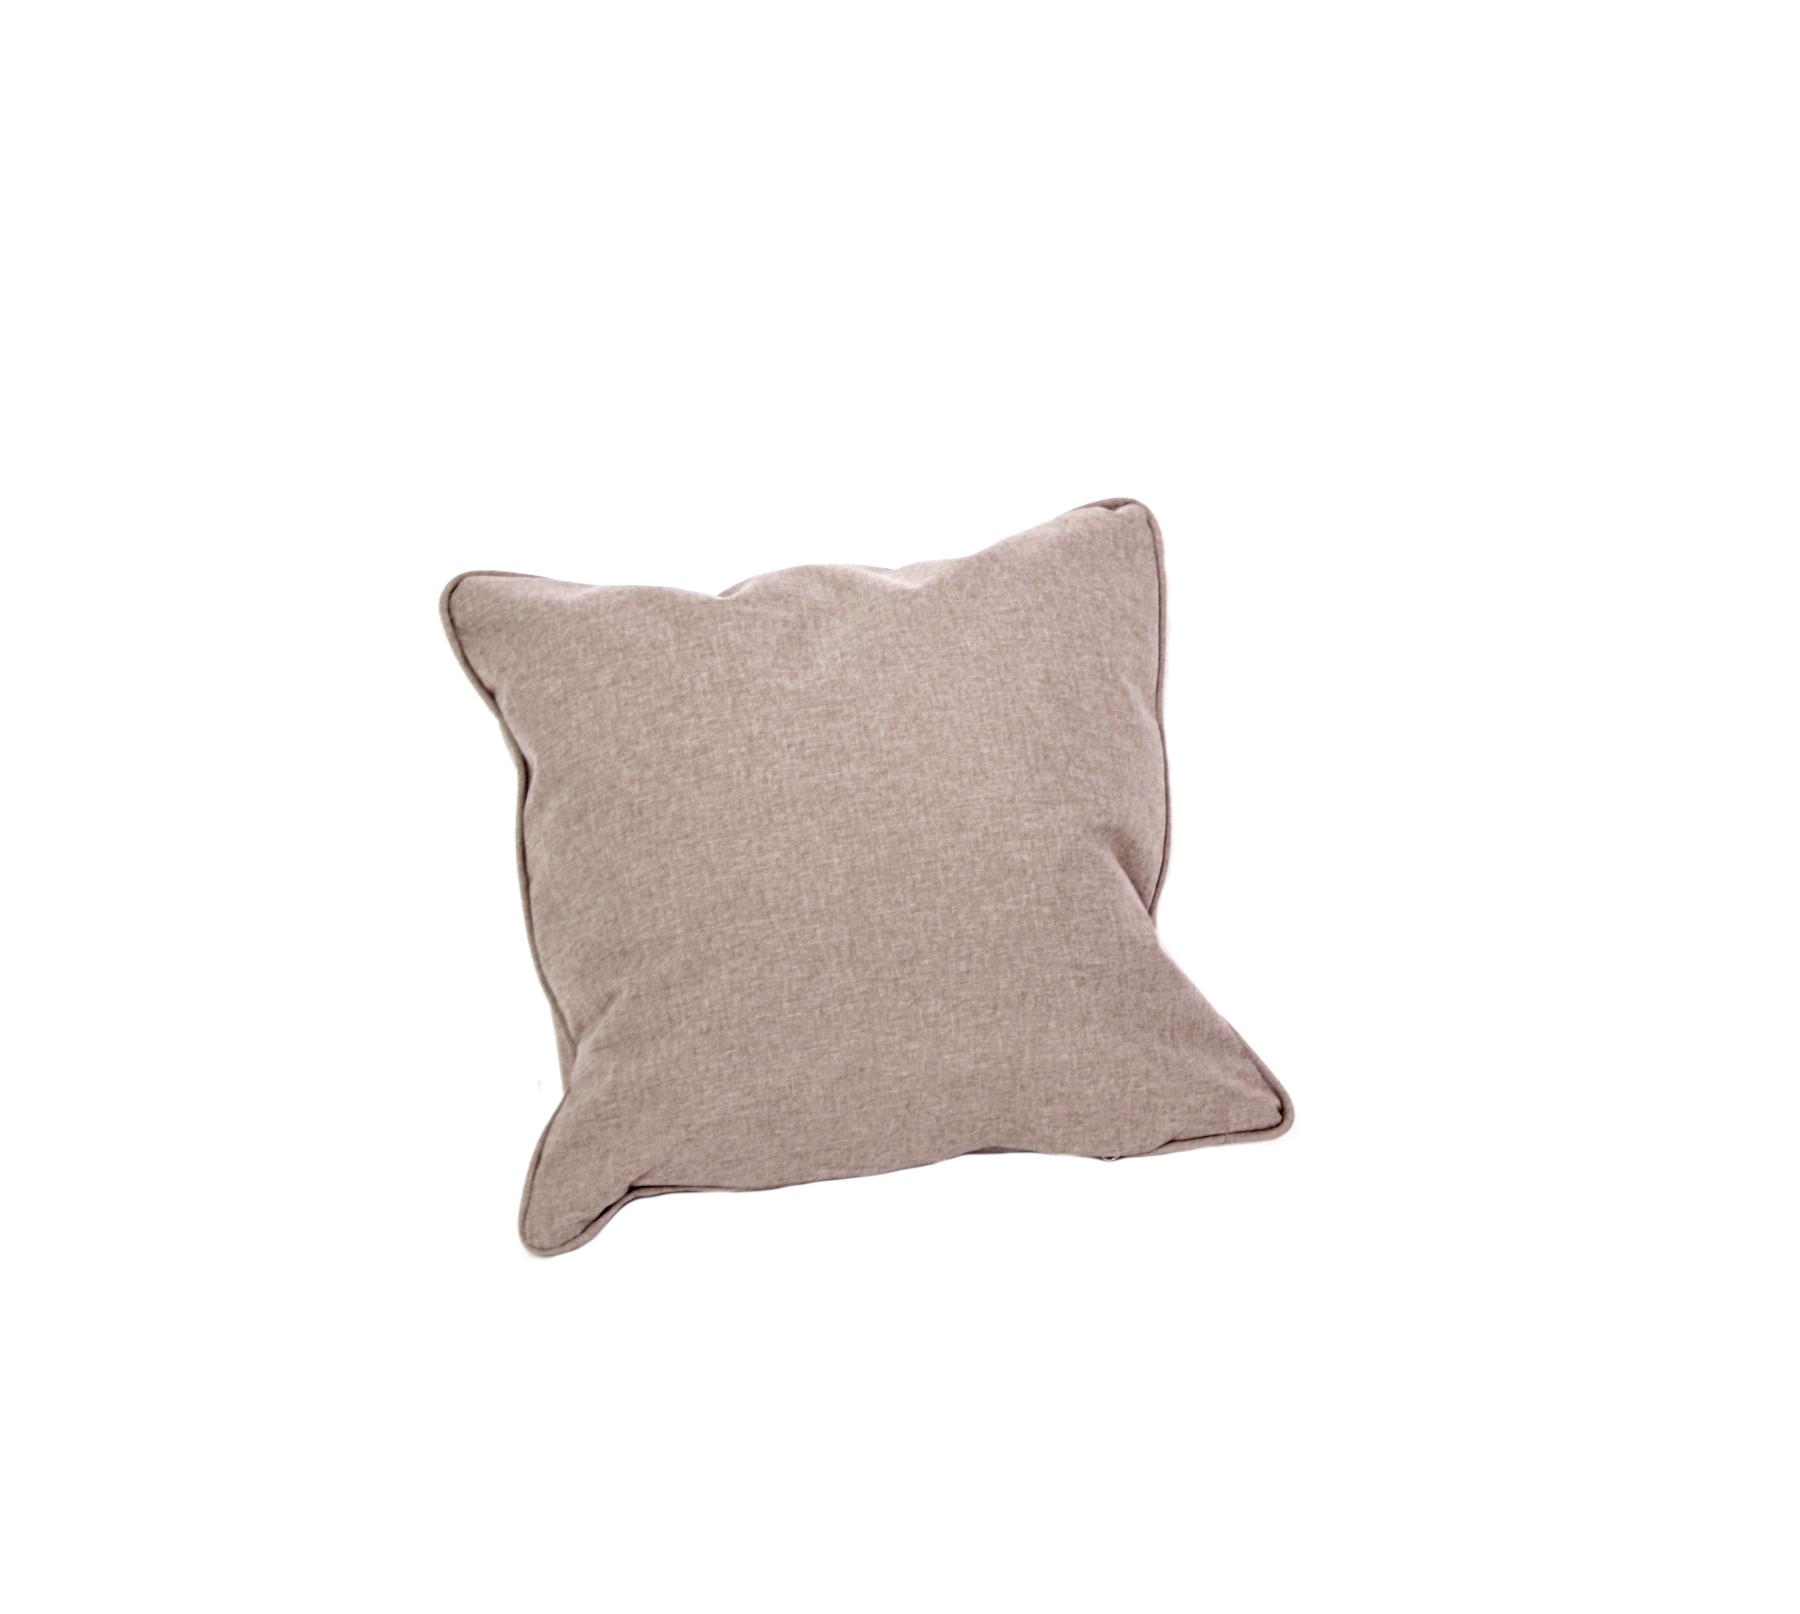 dekokissen orlando 40x40 outdoor dekokissen von supersack. Black Bedroom Furniture Sets. Home Design Ideas